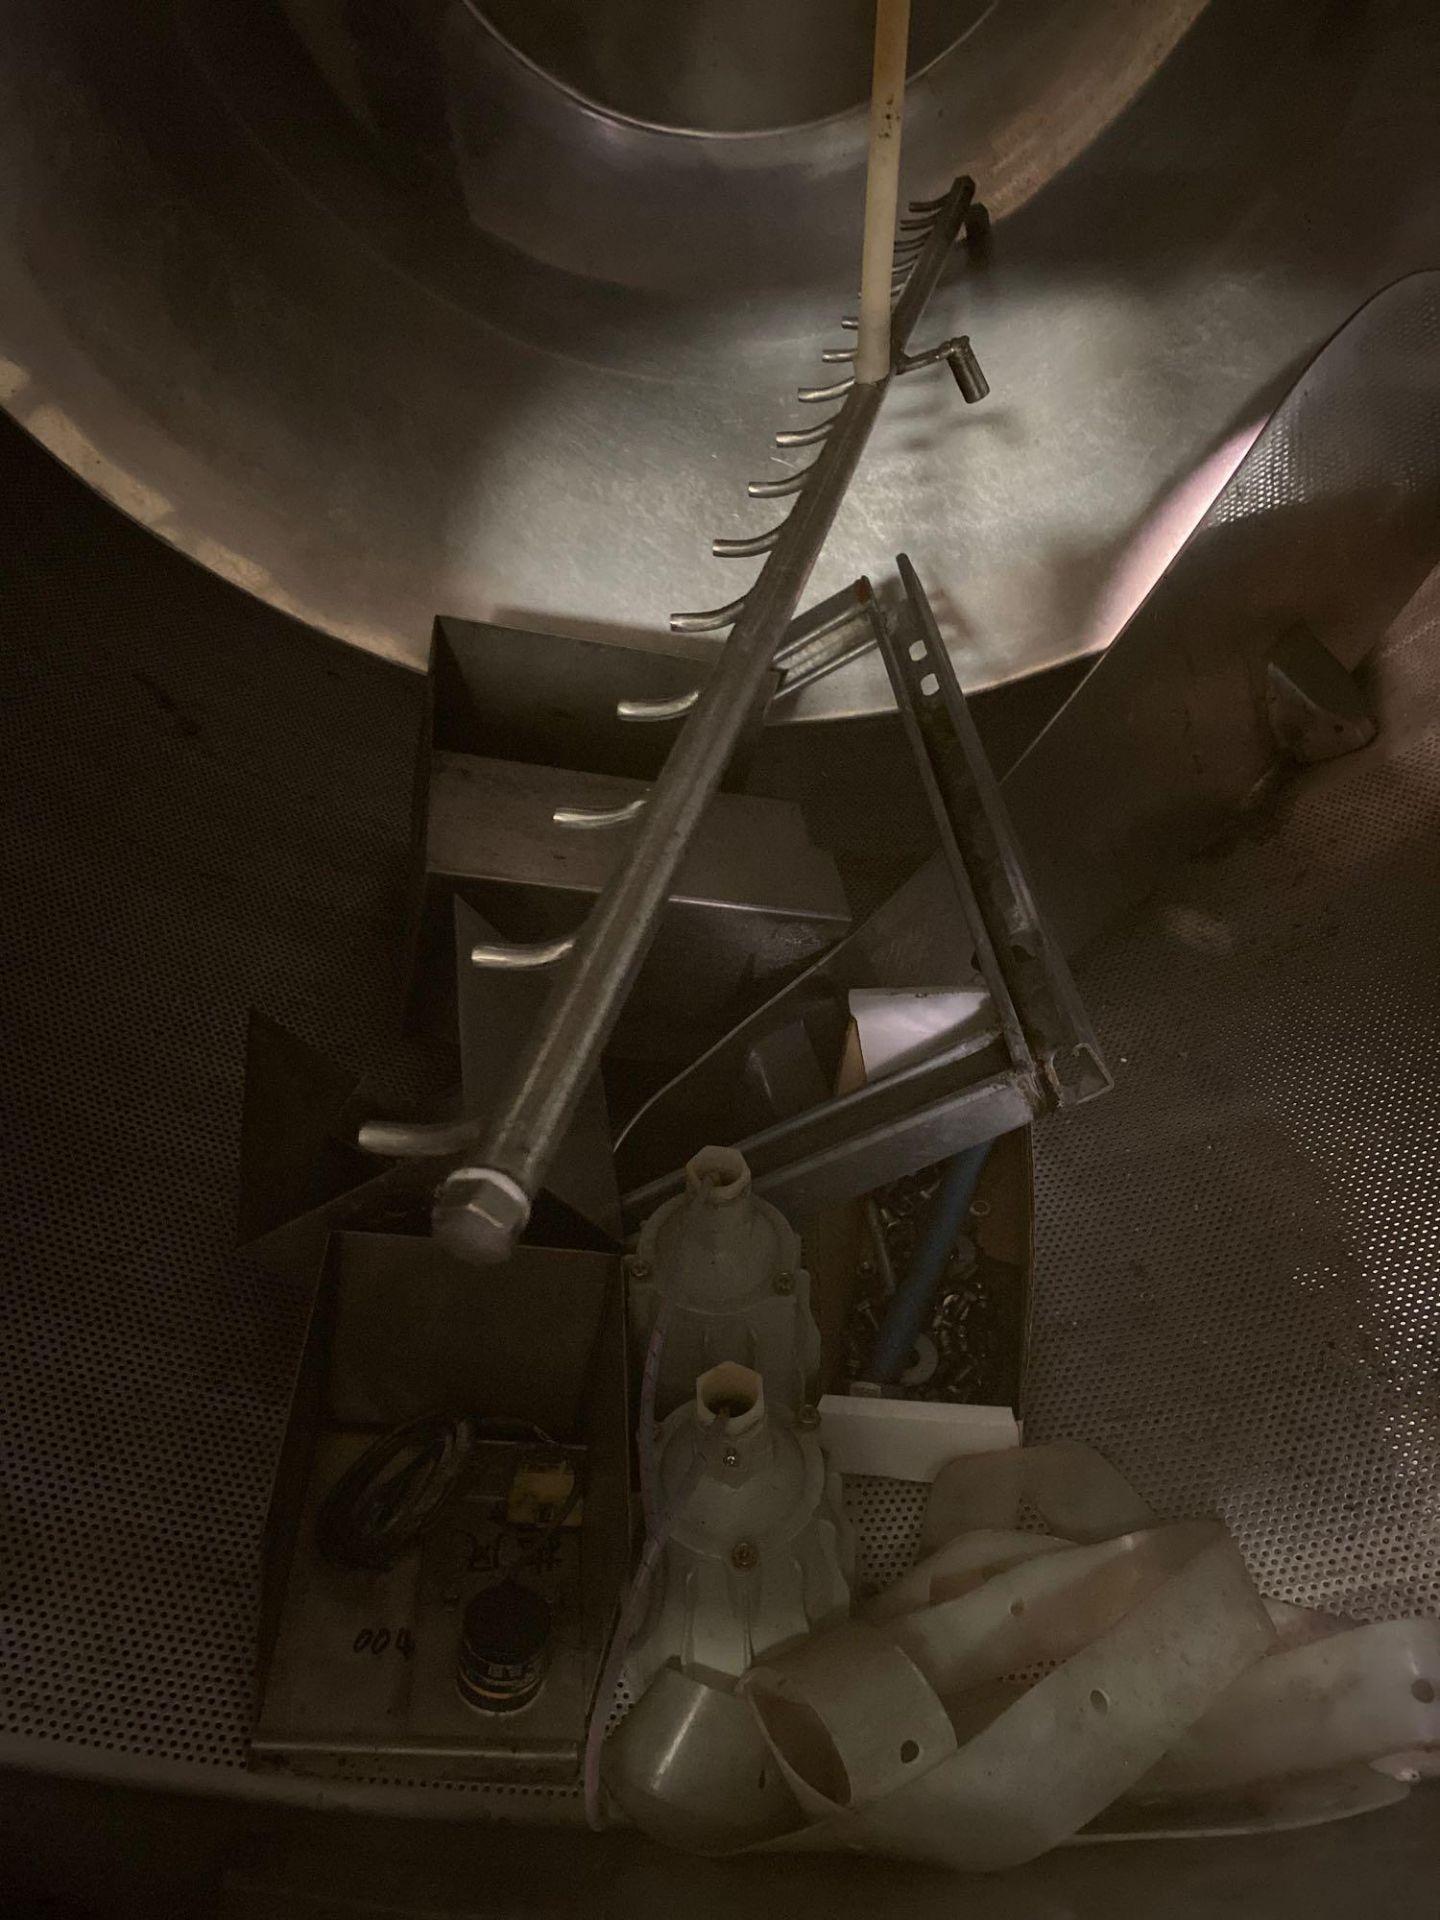 High Efficiency Intelligent Film Coating Machine/Pan Coater - Image 6 of 7